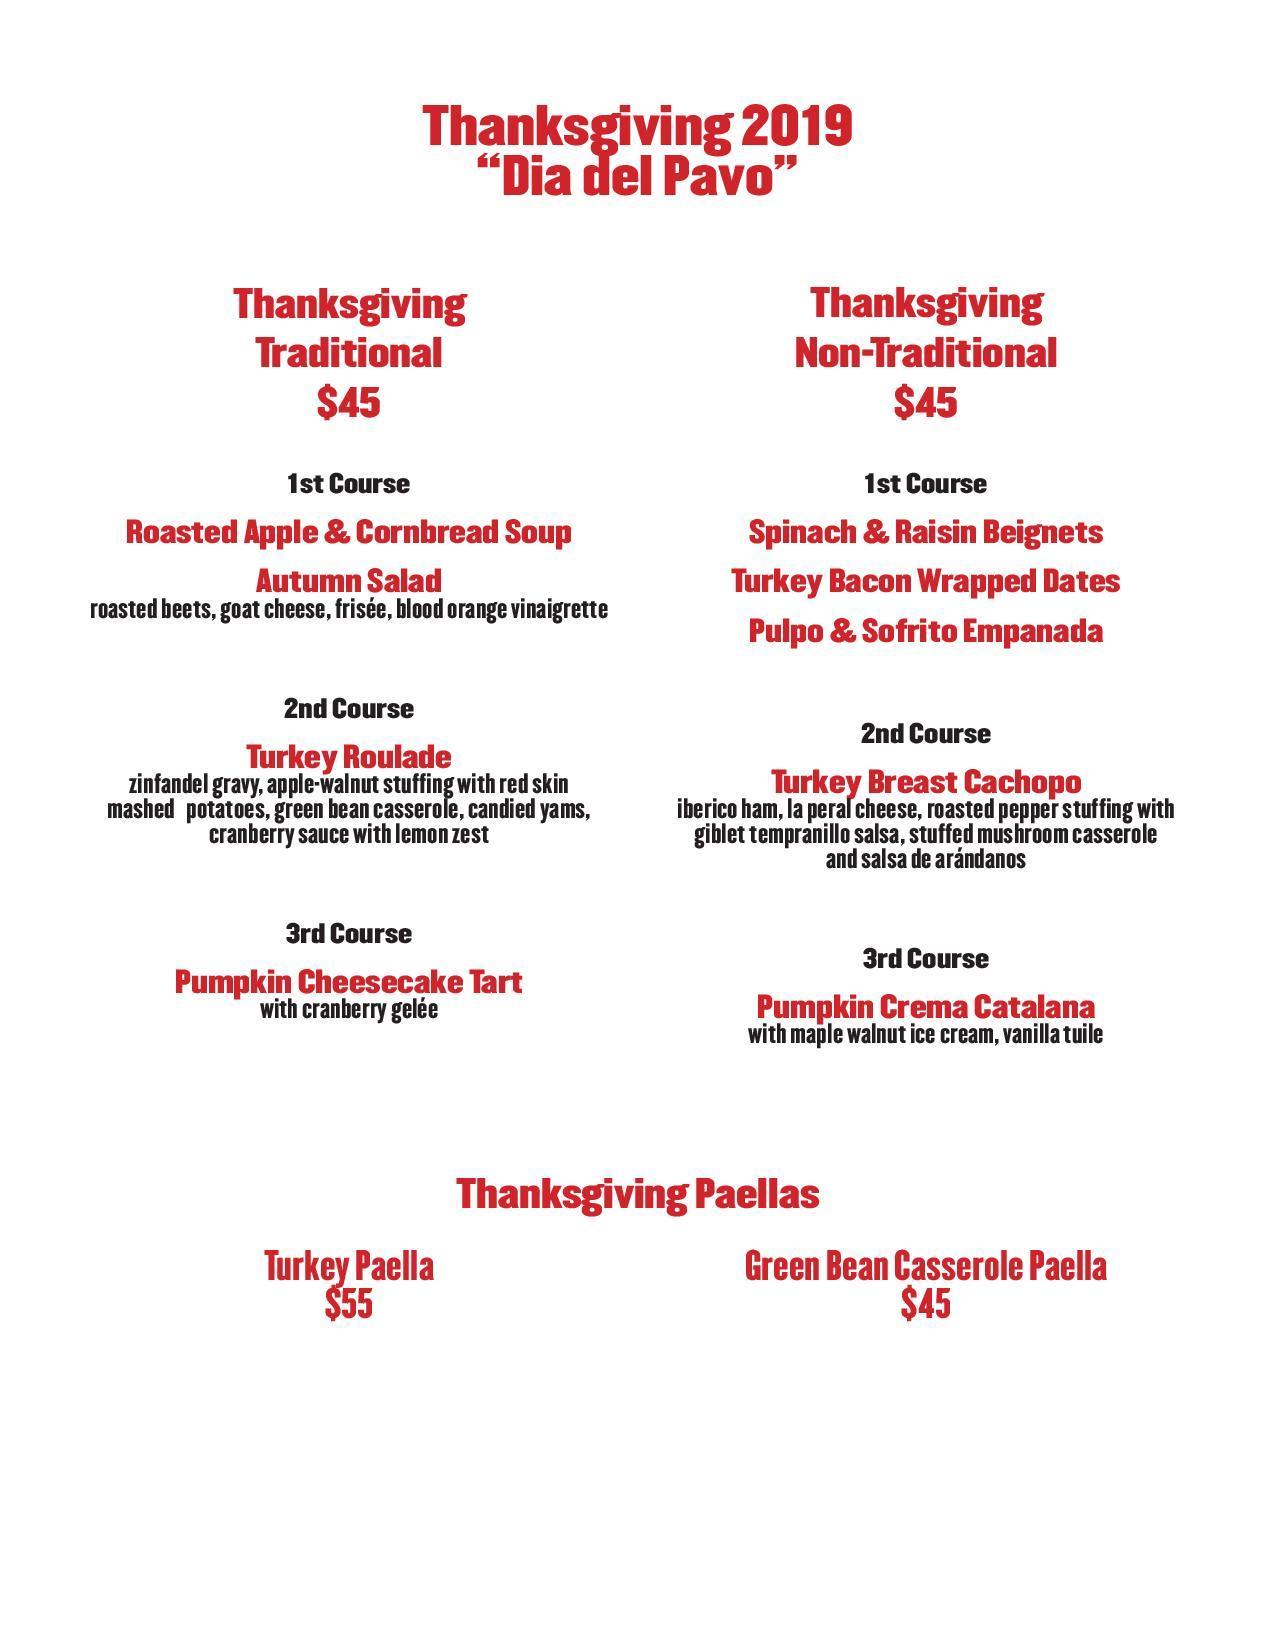 Mercat Chicago Spanish Thanksgiving 2019 Page 001